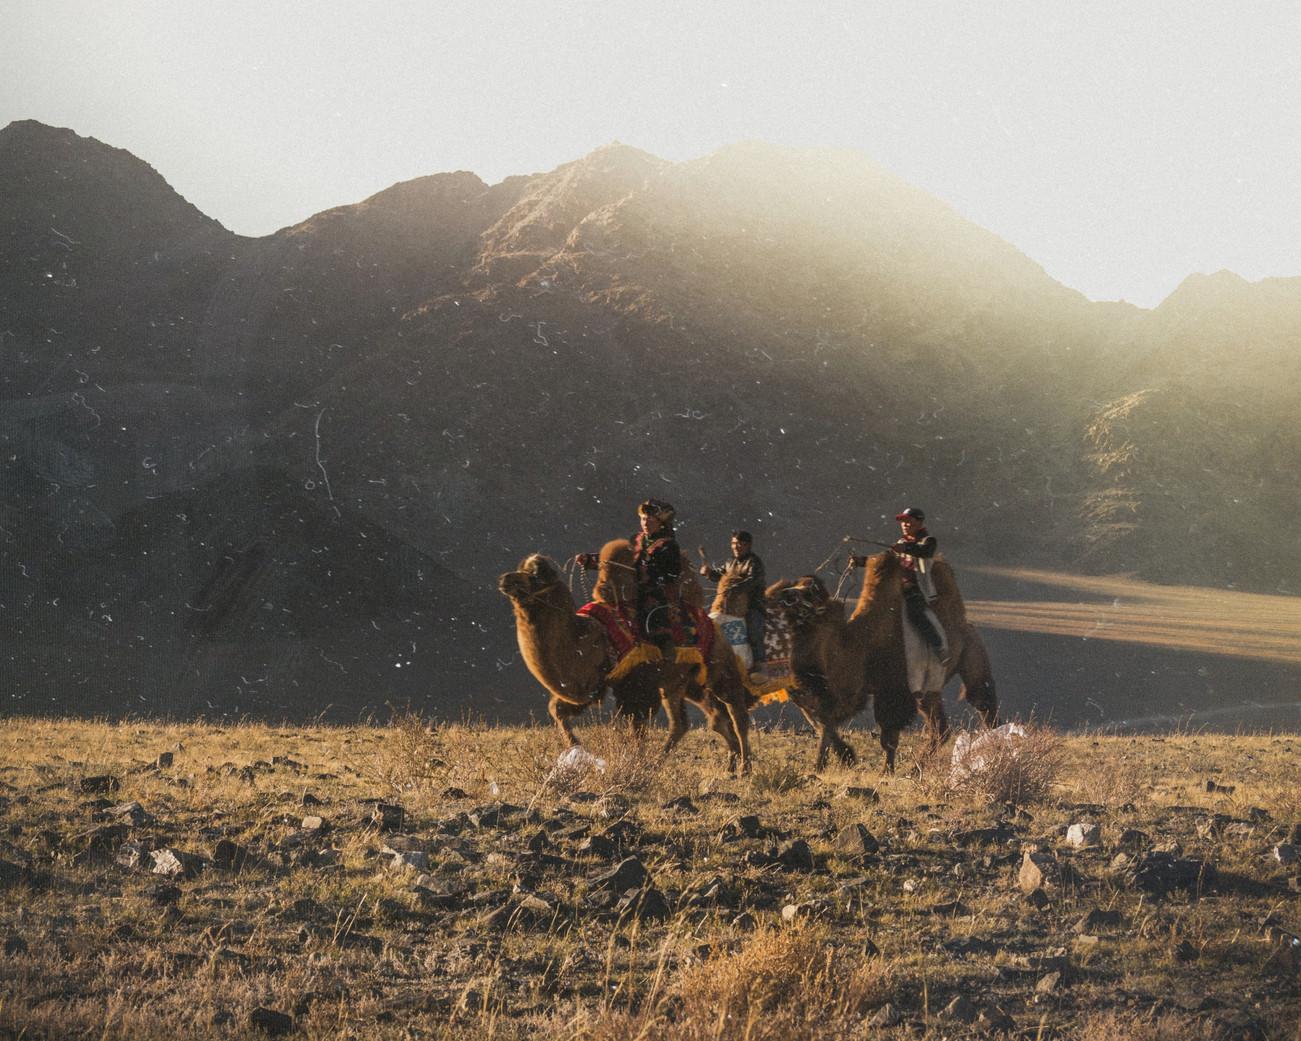 Mongolie 2019